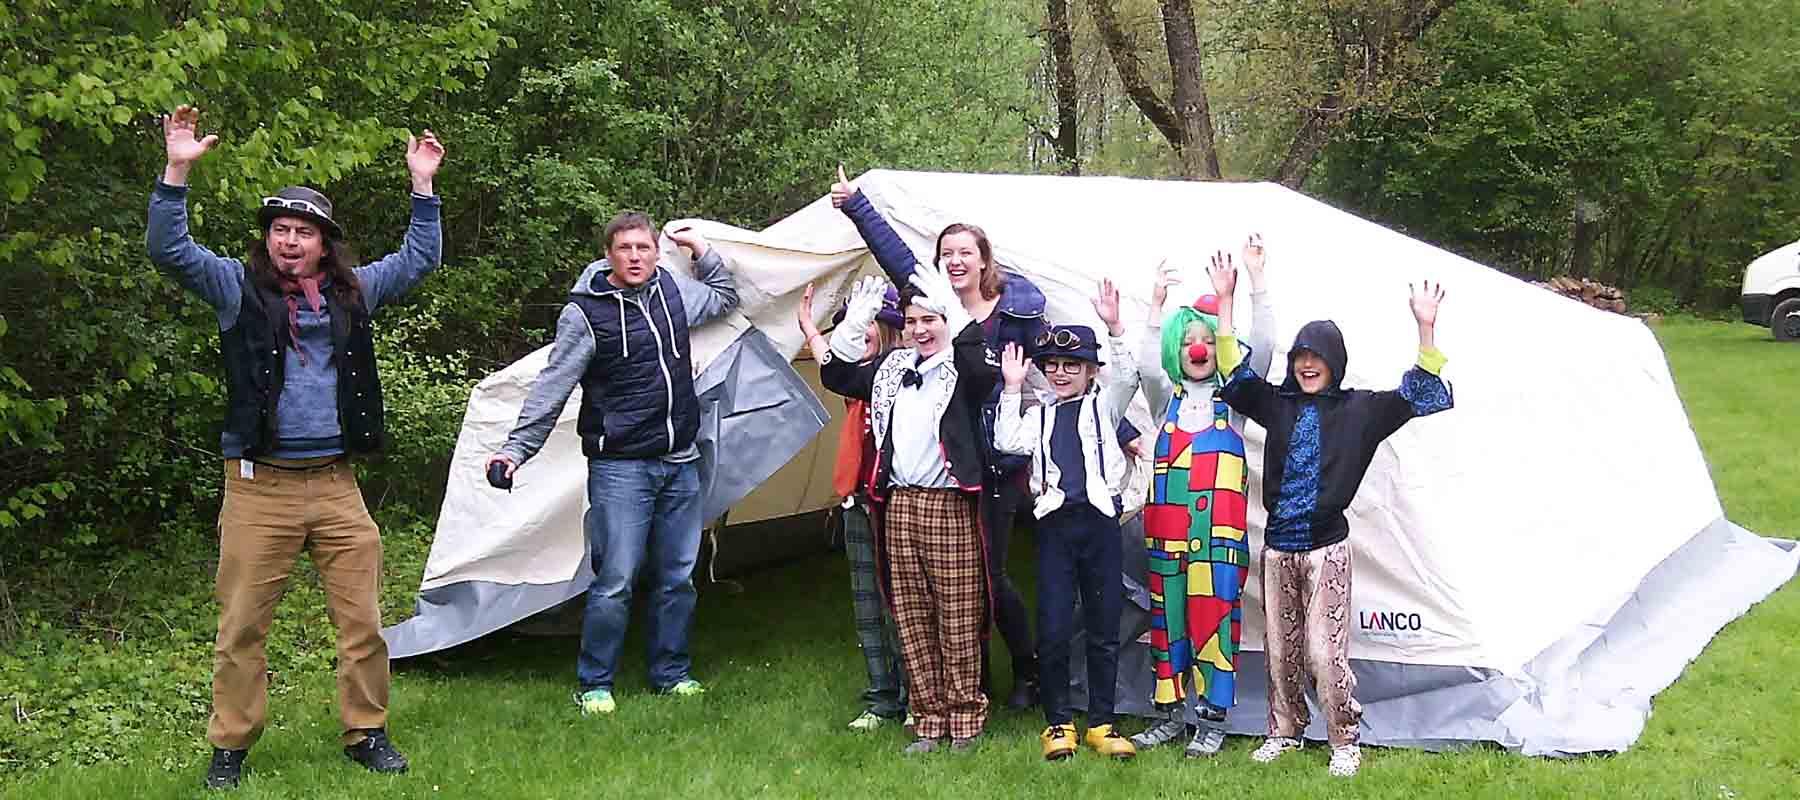 Zelte für den Stadtjugendring Rosenheim